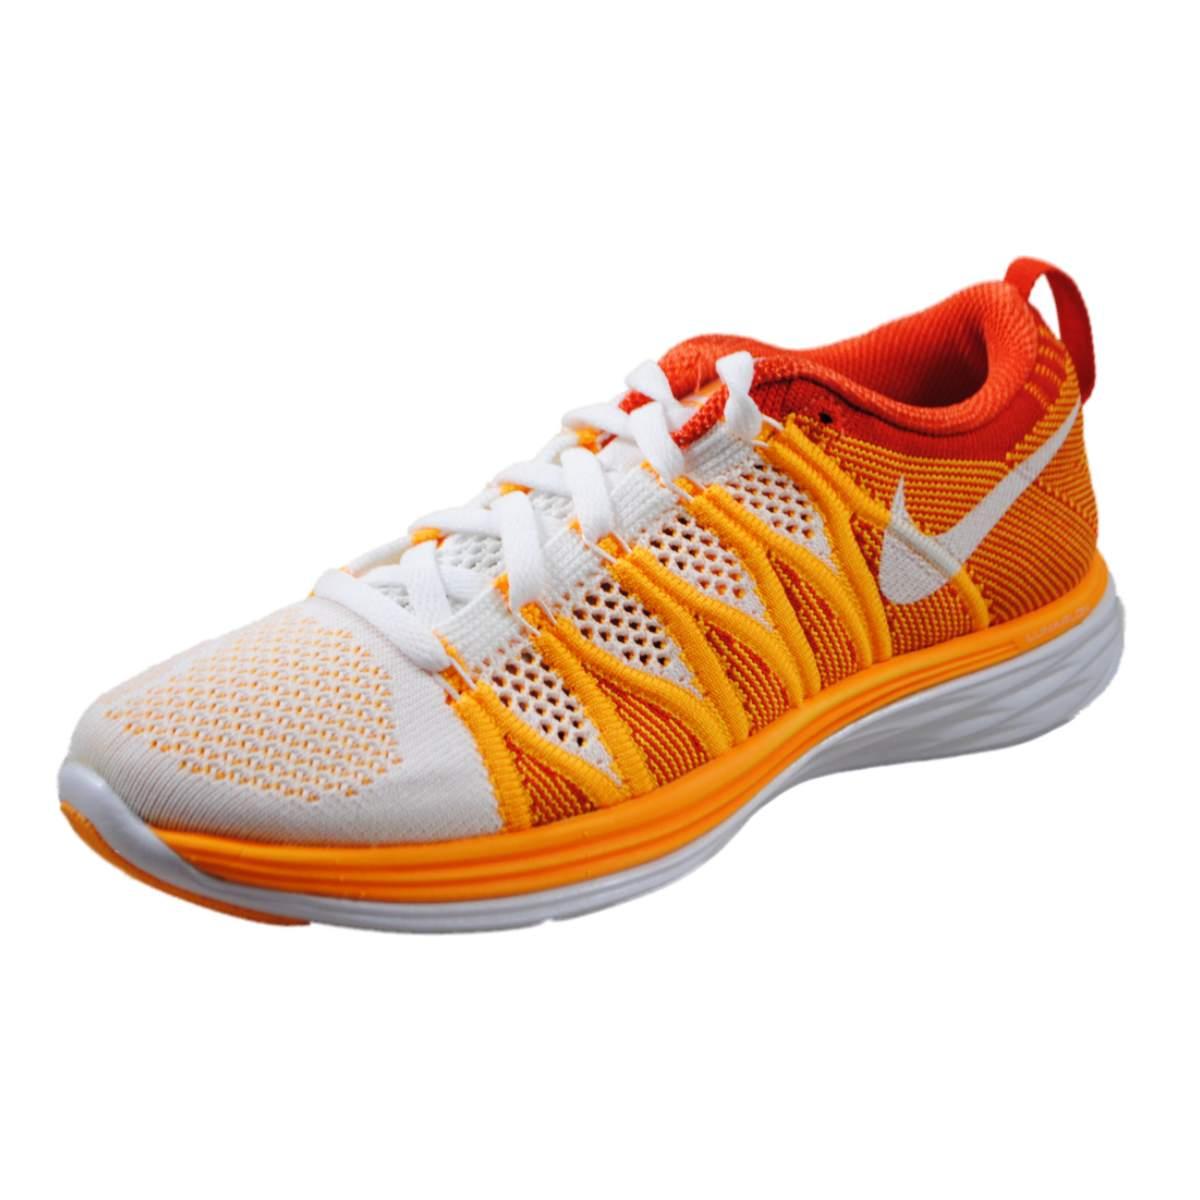 96c16d822c1 Nike Flyknit Lunar 2 Women s Running Shoes HO14 Womens Green